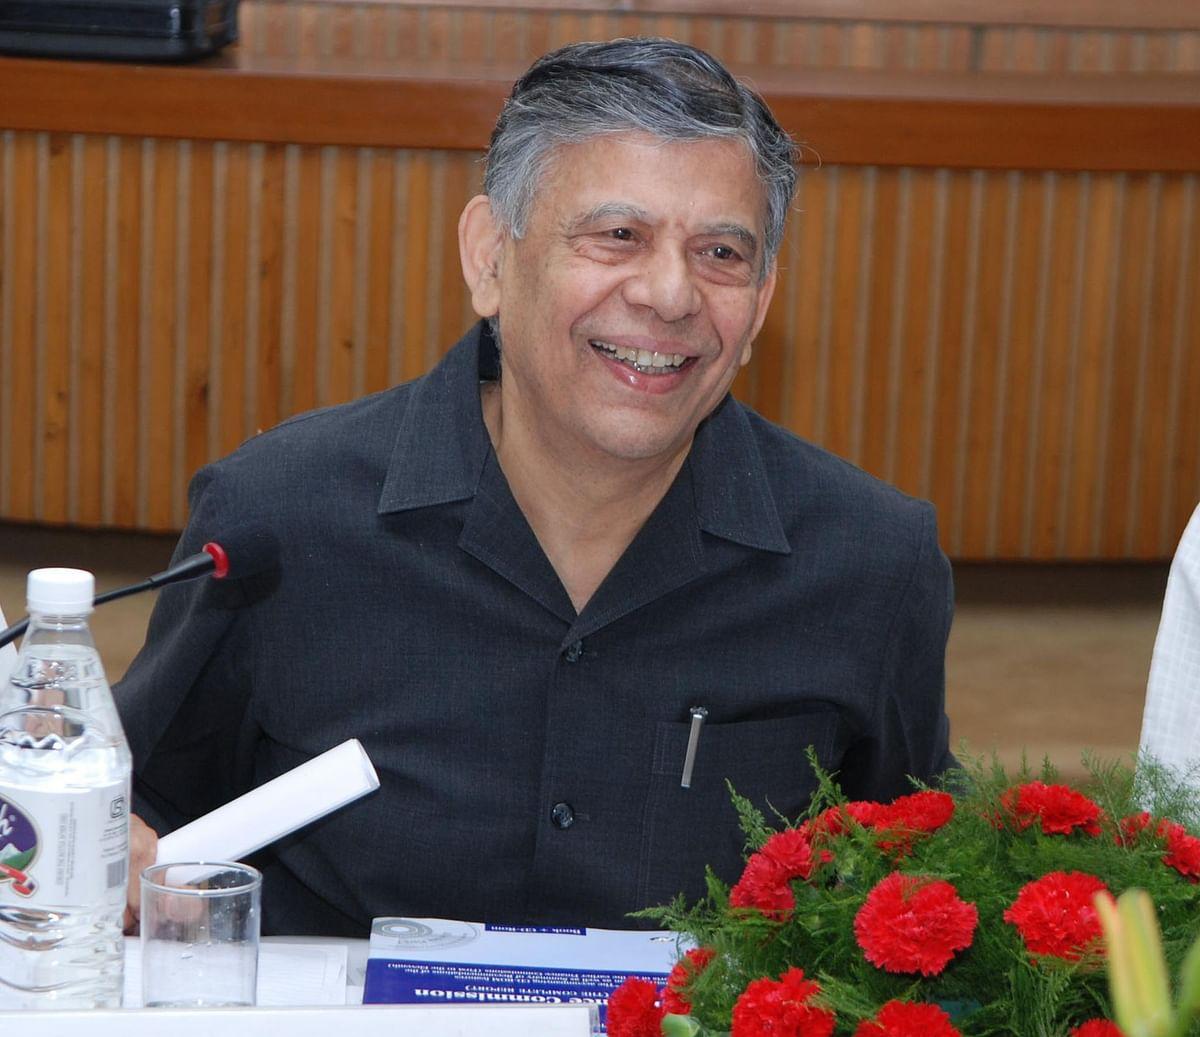 Have sunset clause for economic laws constraining growth: Vijay Kelkar